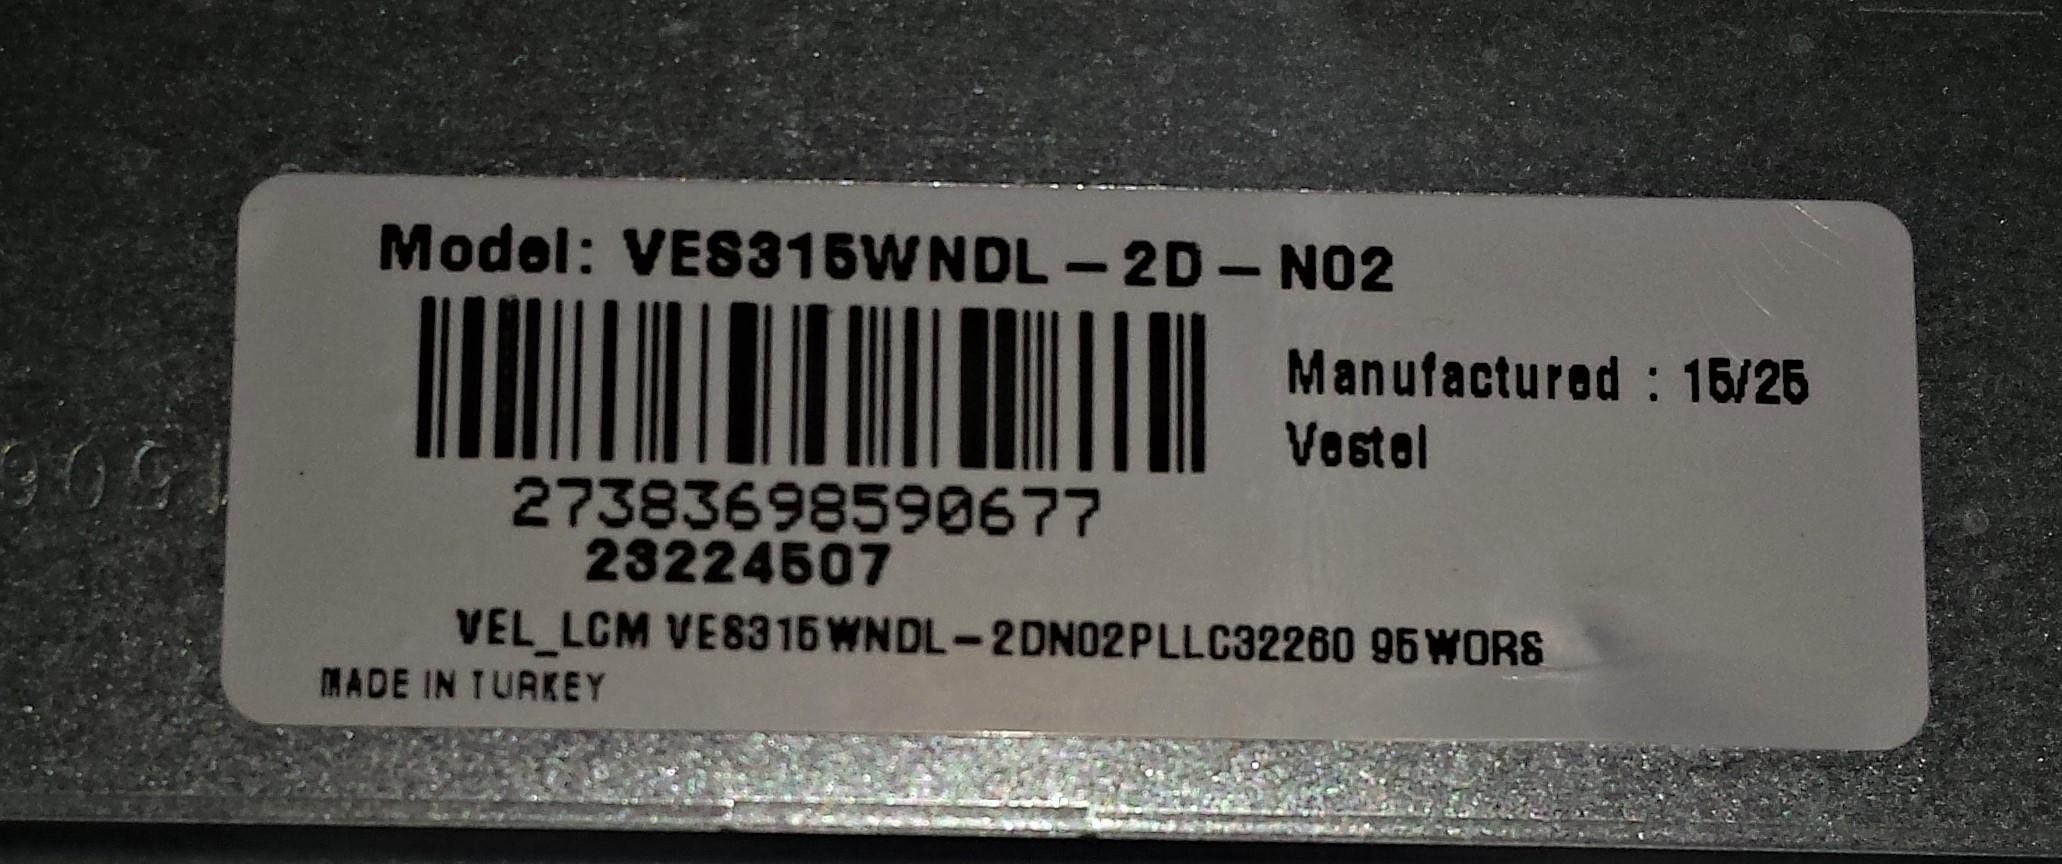 dk32280b, Dikom, 17mb82s, bin file - elektroda pl